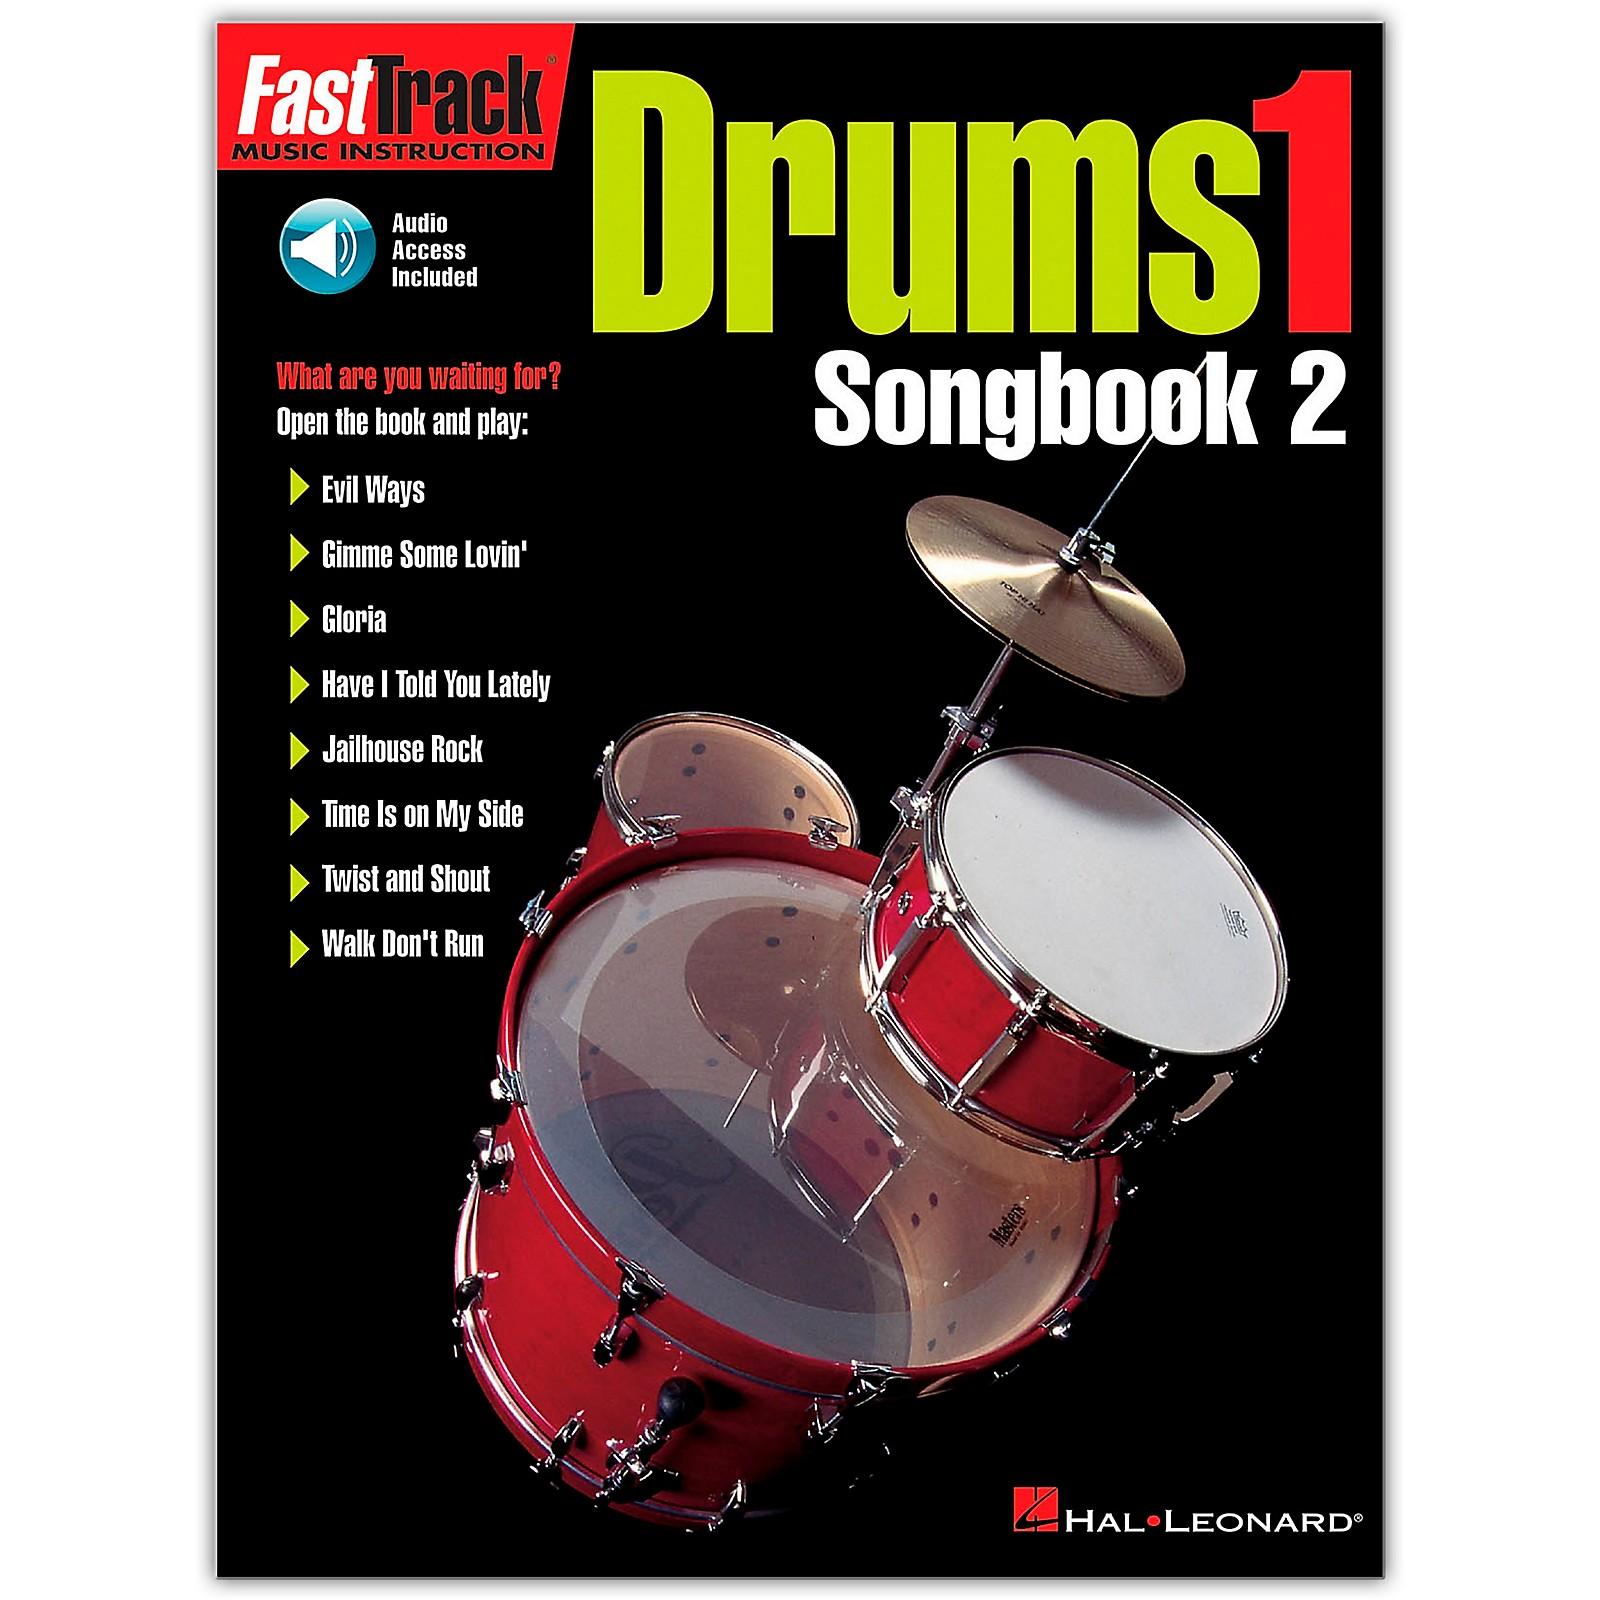 Hal Leonard FastTrack Drum Songbook 2 - Level 1 (Book/Online Audio)